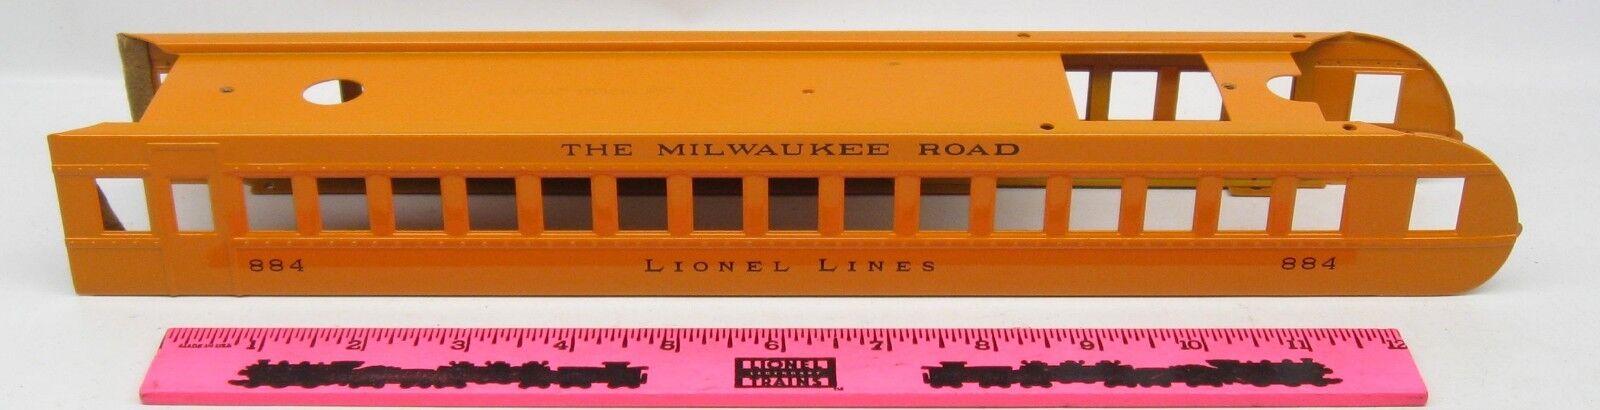 Lionel 884 Hiawatha el vehículo de pasajeros en línea Milwaukee Milwaukee Milwaukee Road 105